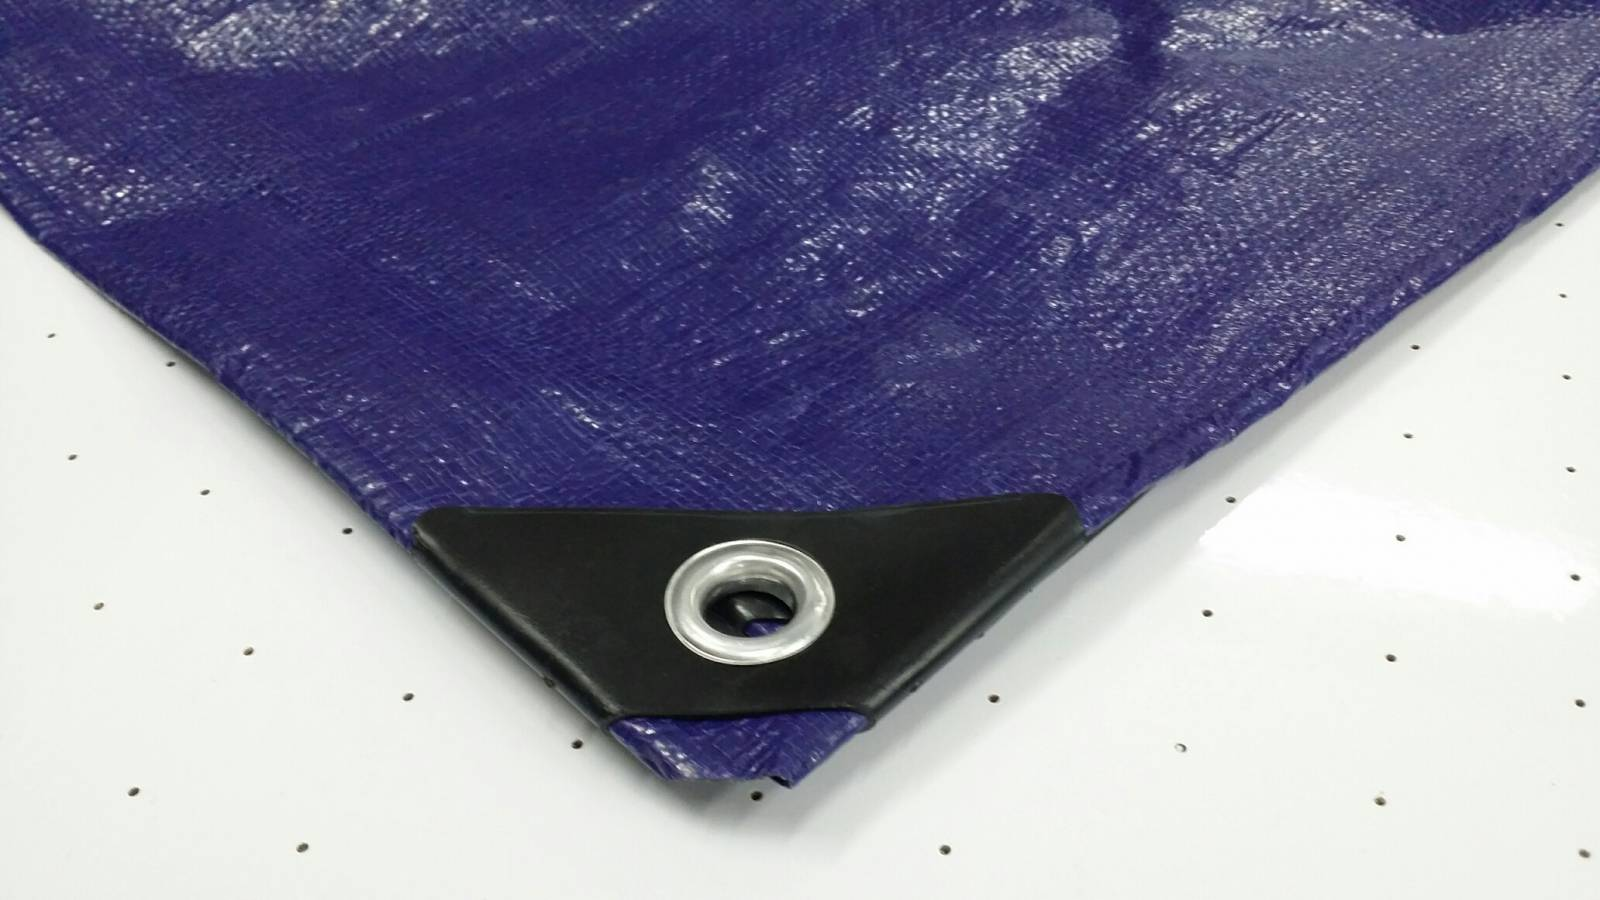 Lona extra reforzada 6X7m (Heavy Duty) impermeable y multiuso